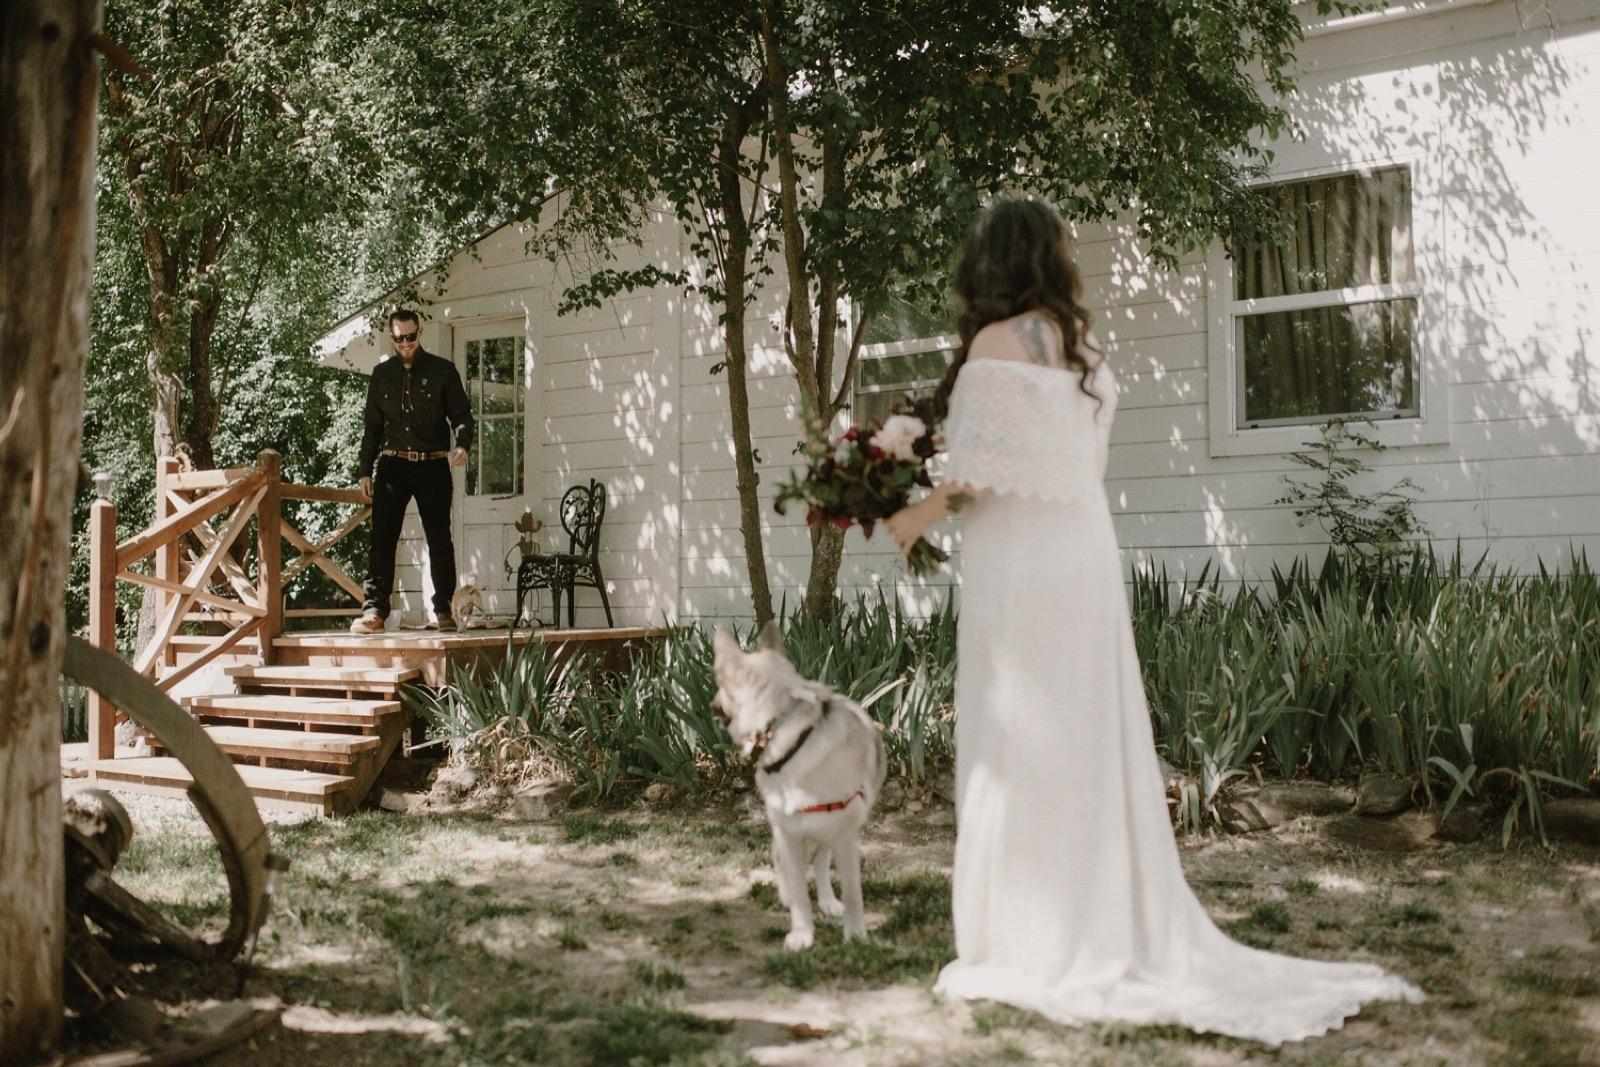 040_California_Ranch_Wedding095.jpg